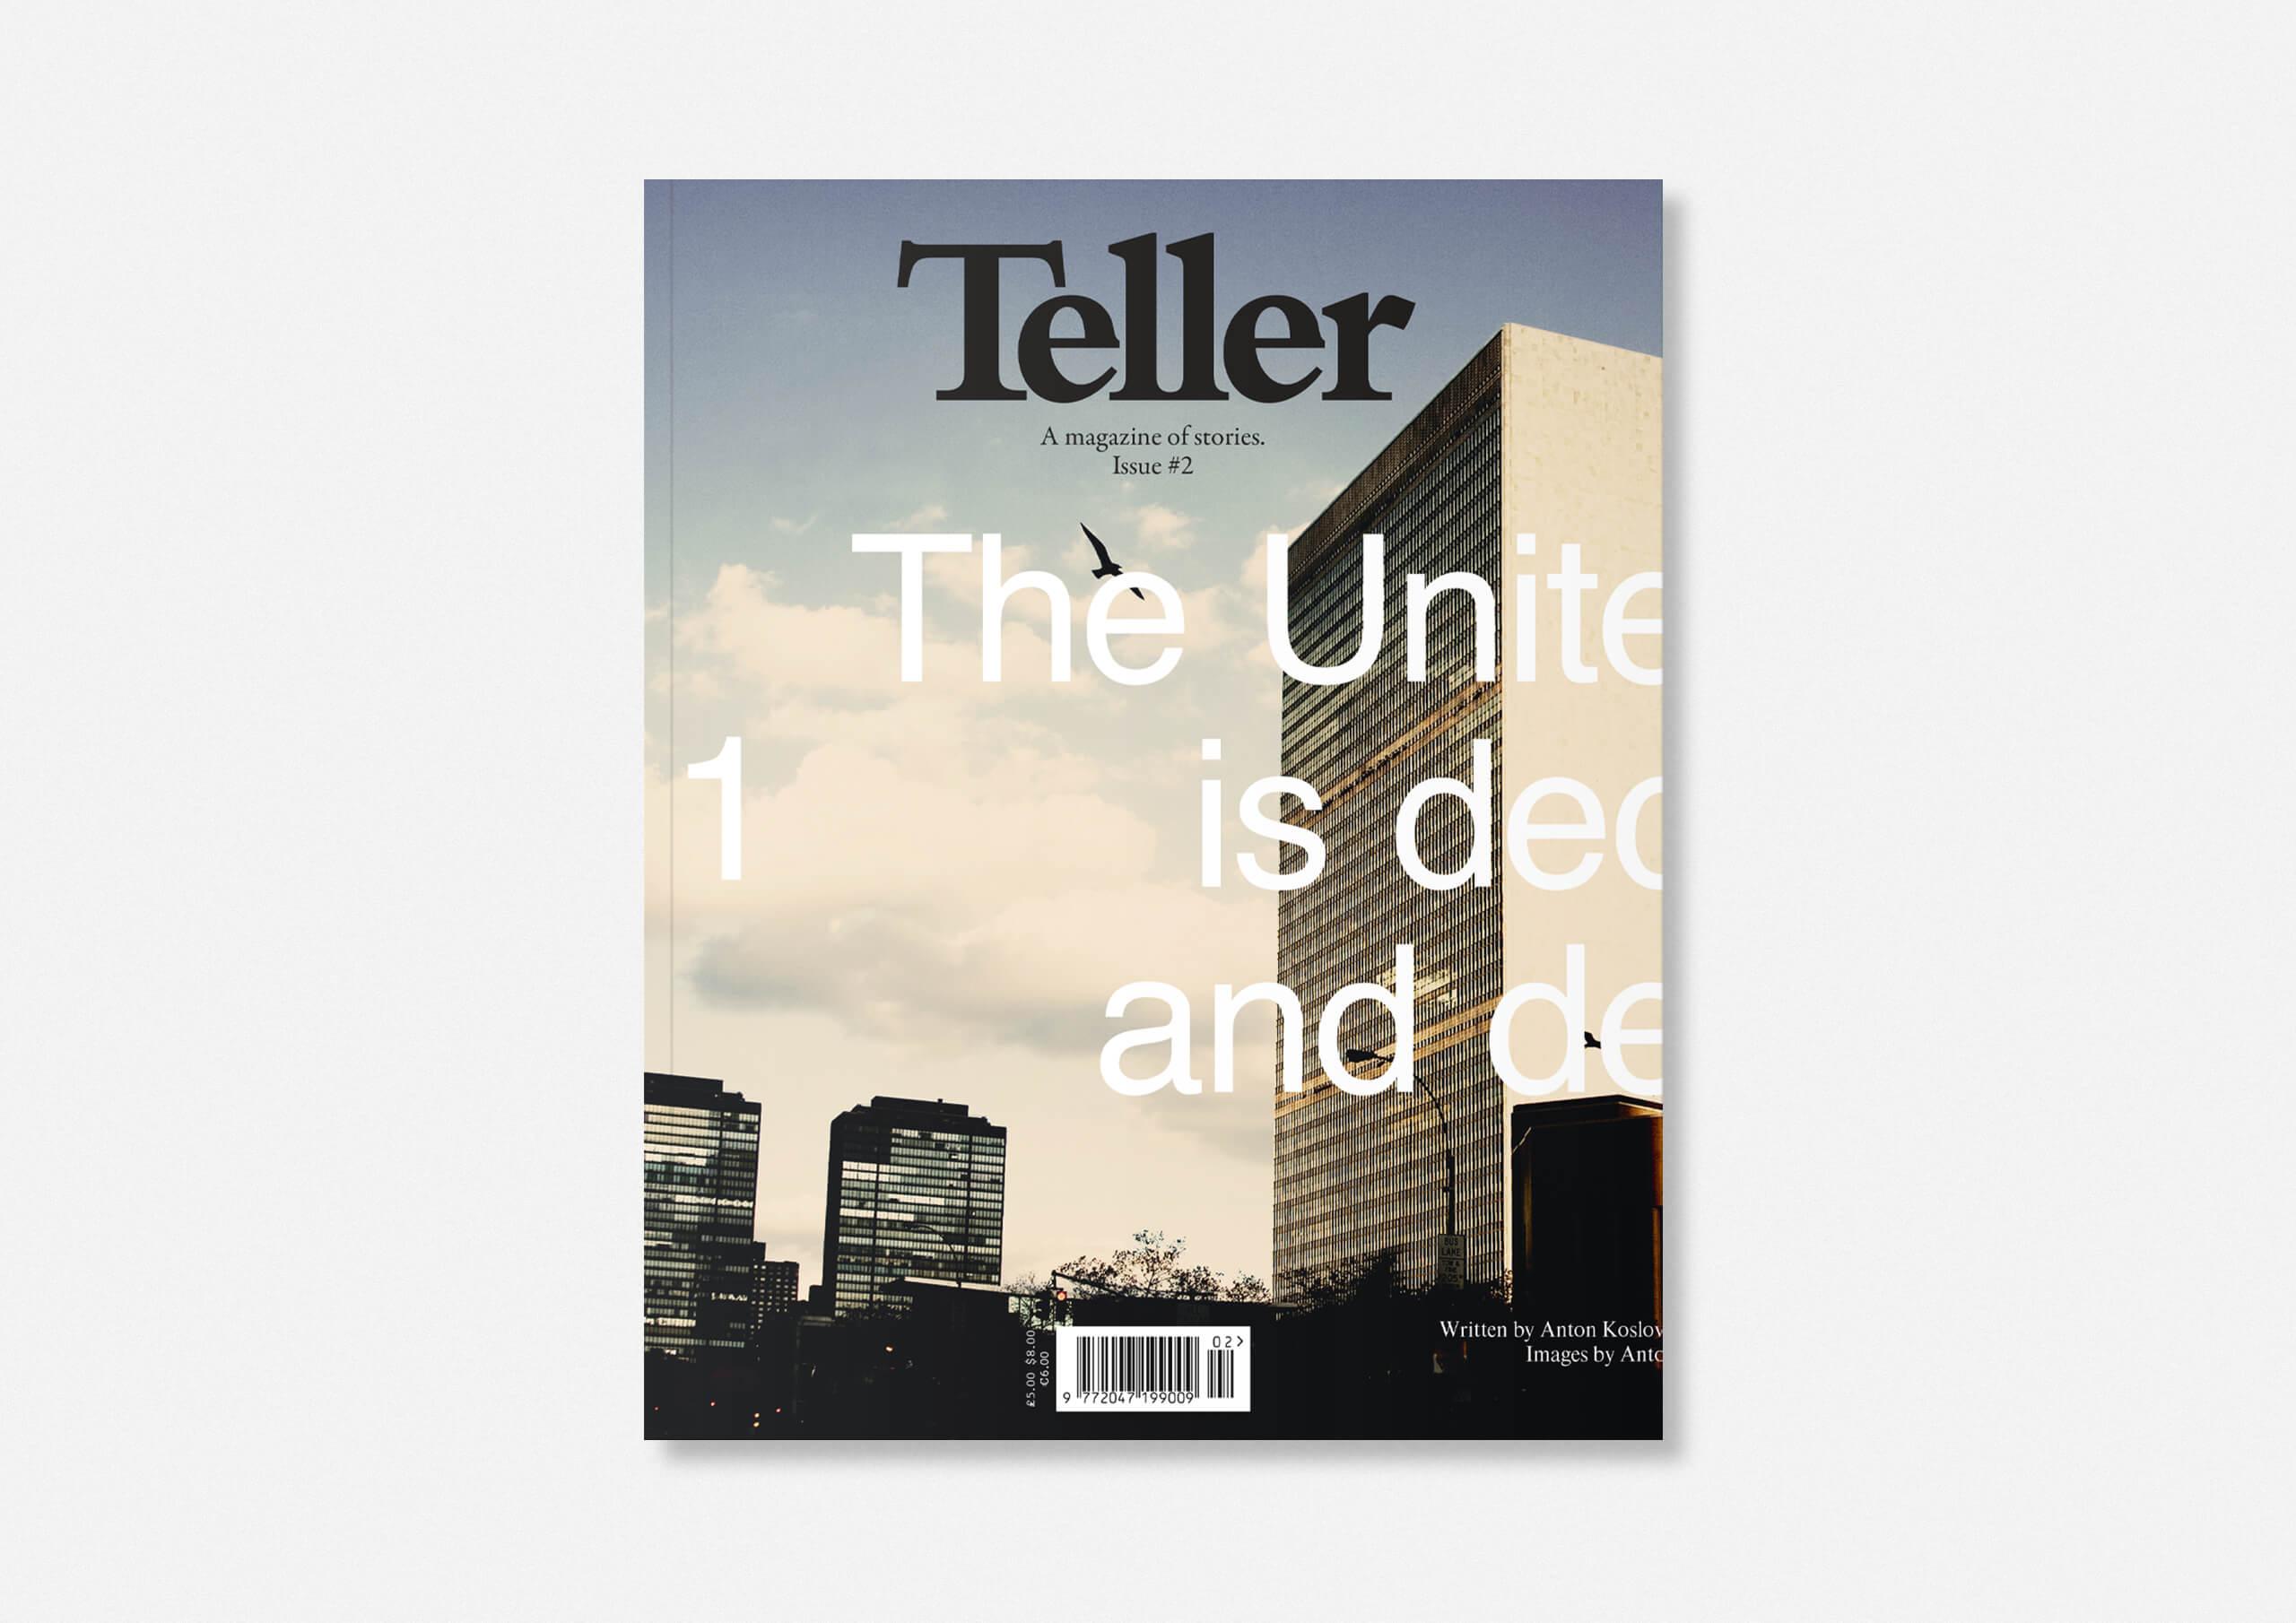 https://neuegestaltung.de/media/pages/clients/teller-magazine-issue-2/c7d4fd5676-1602773596/teller-magazin-issue-02-thumbnail.jpg